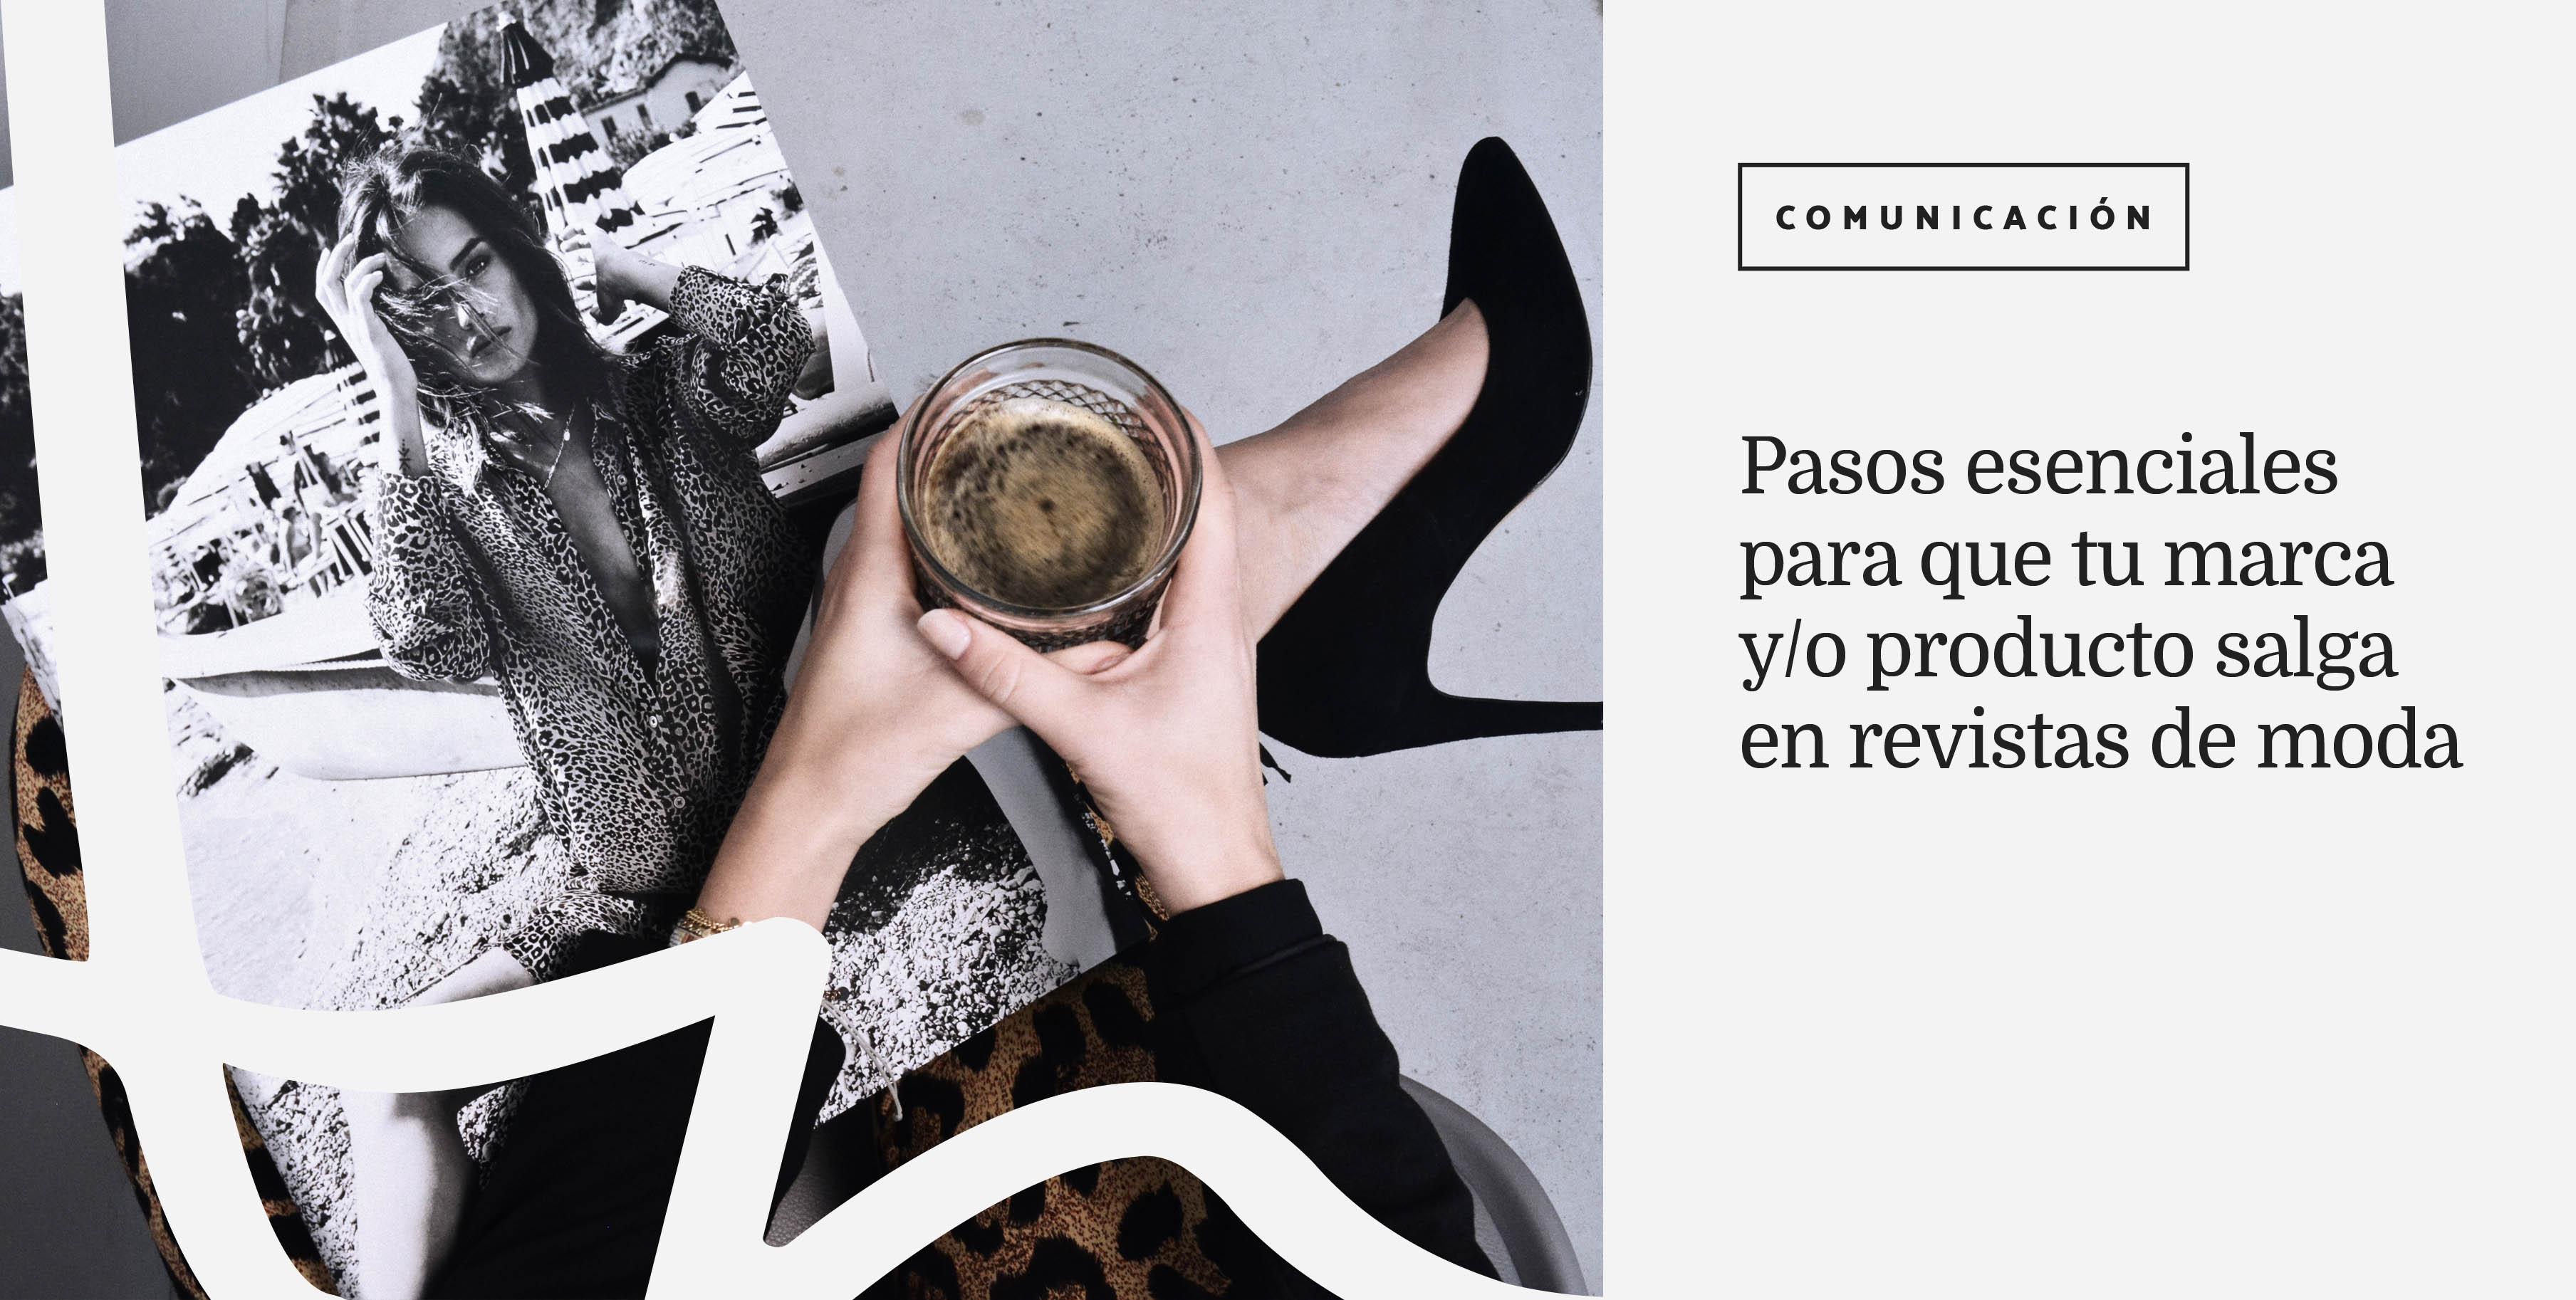 pasos-para-salir-en-revistas-de-moda-Ana-Diaz-del-Rio-Portada